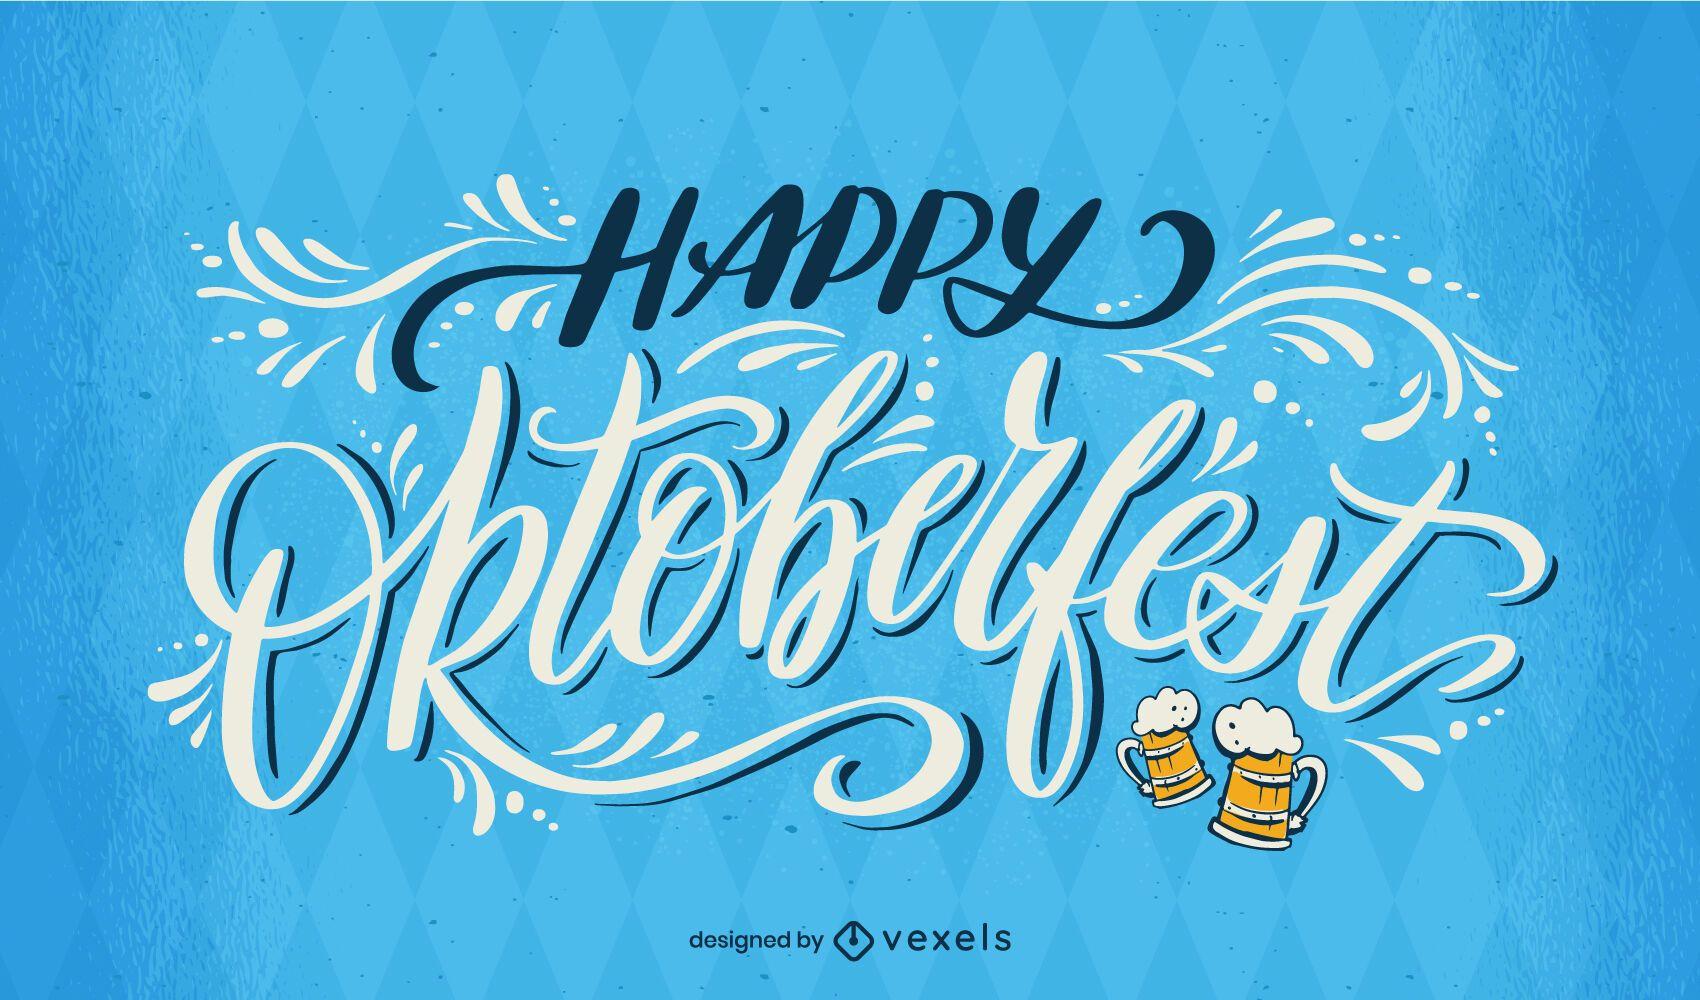 Happy Oktoberfest calligraphy lettering